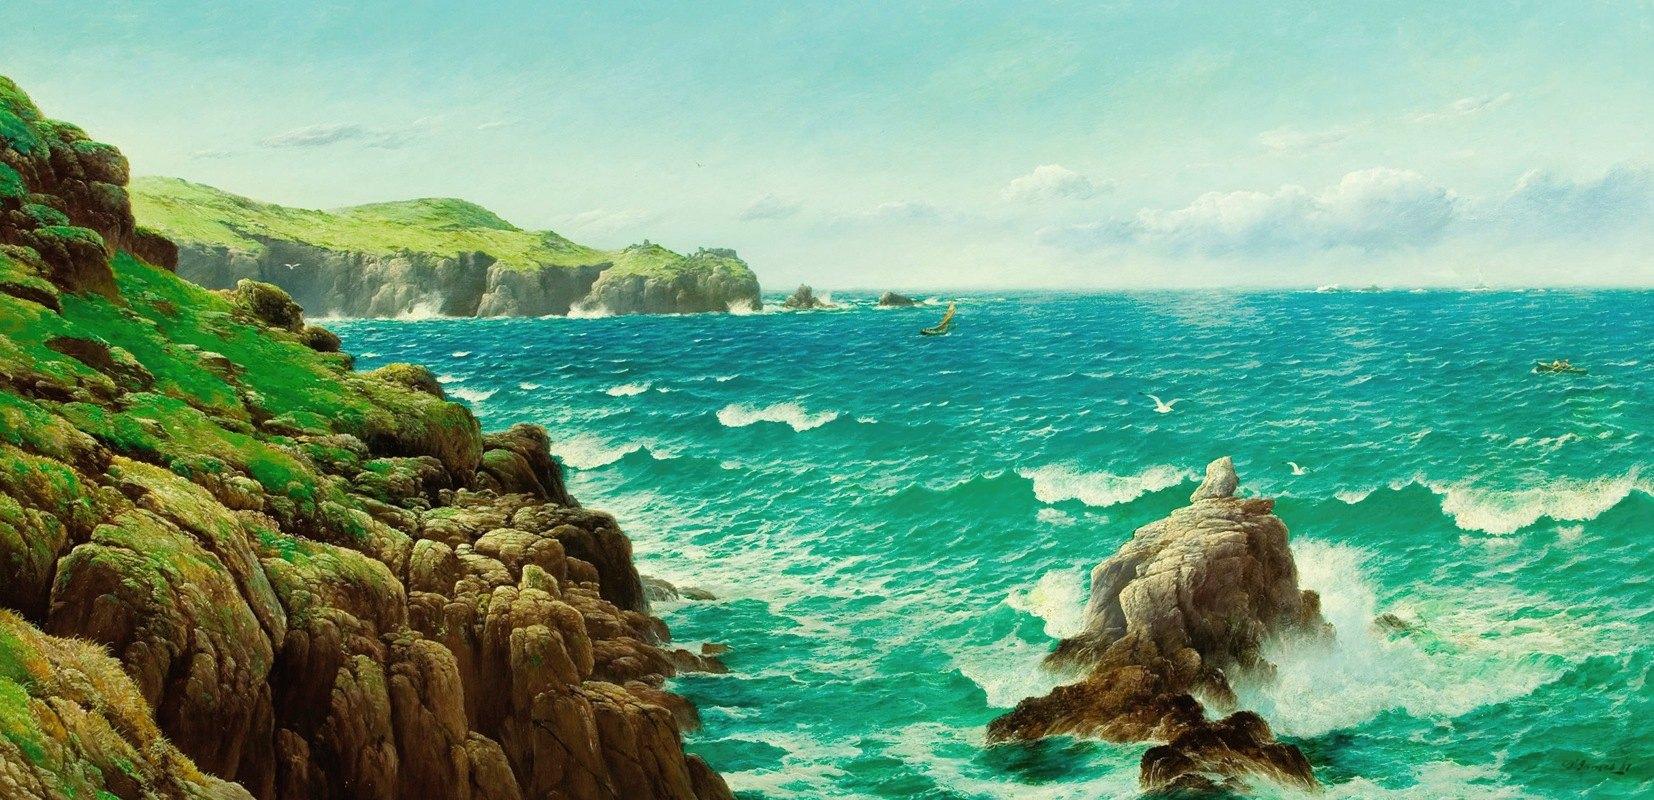 David James - Sea Cliffs